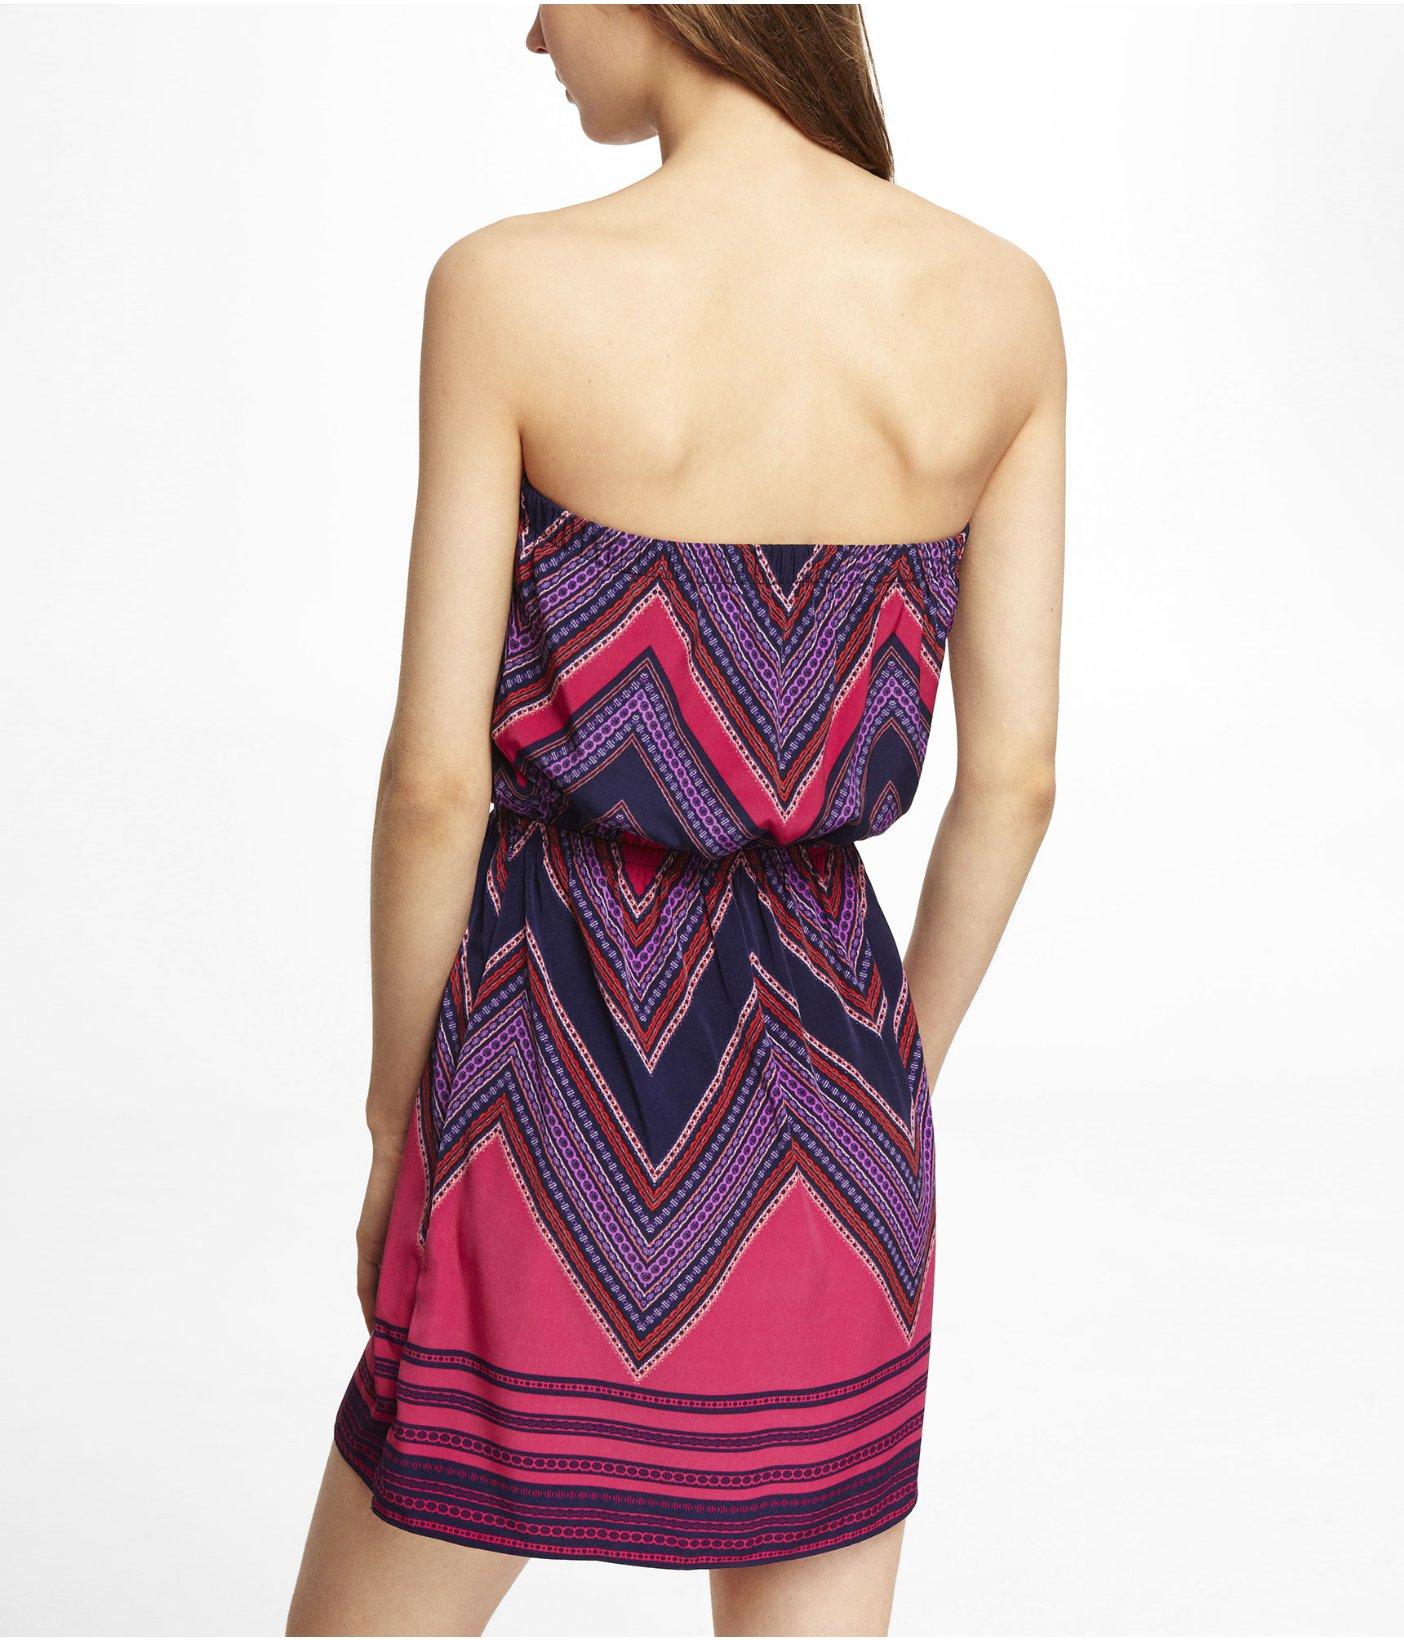 Lyst - Express Purple Scarf Print Tube Dress in Purple